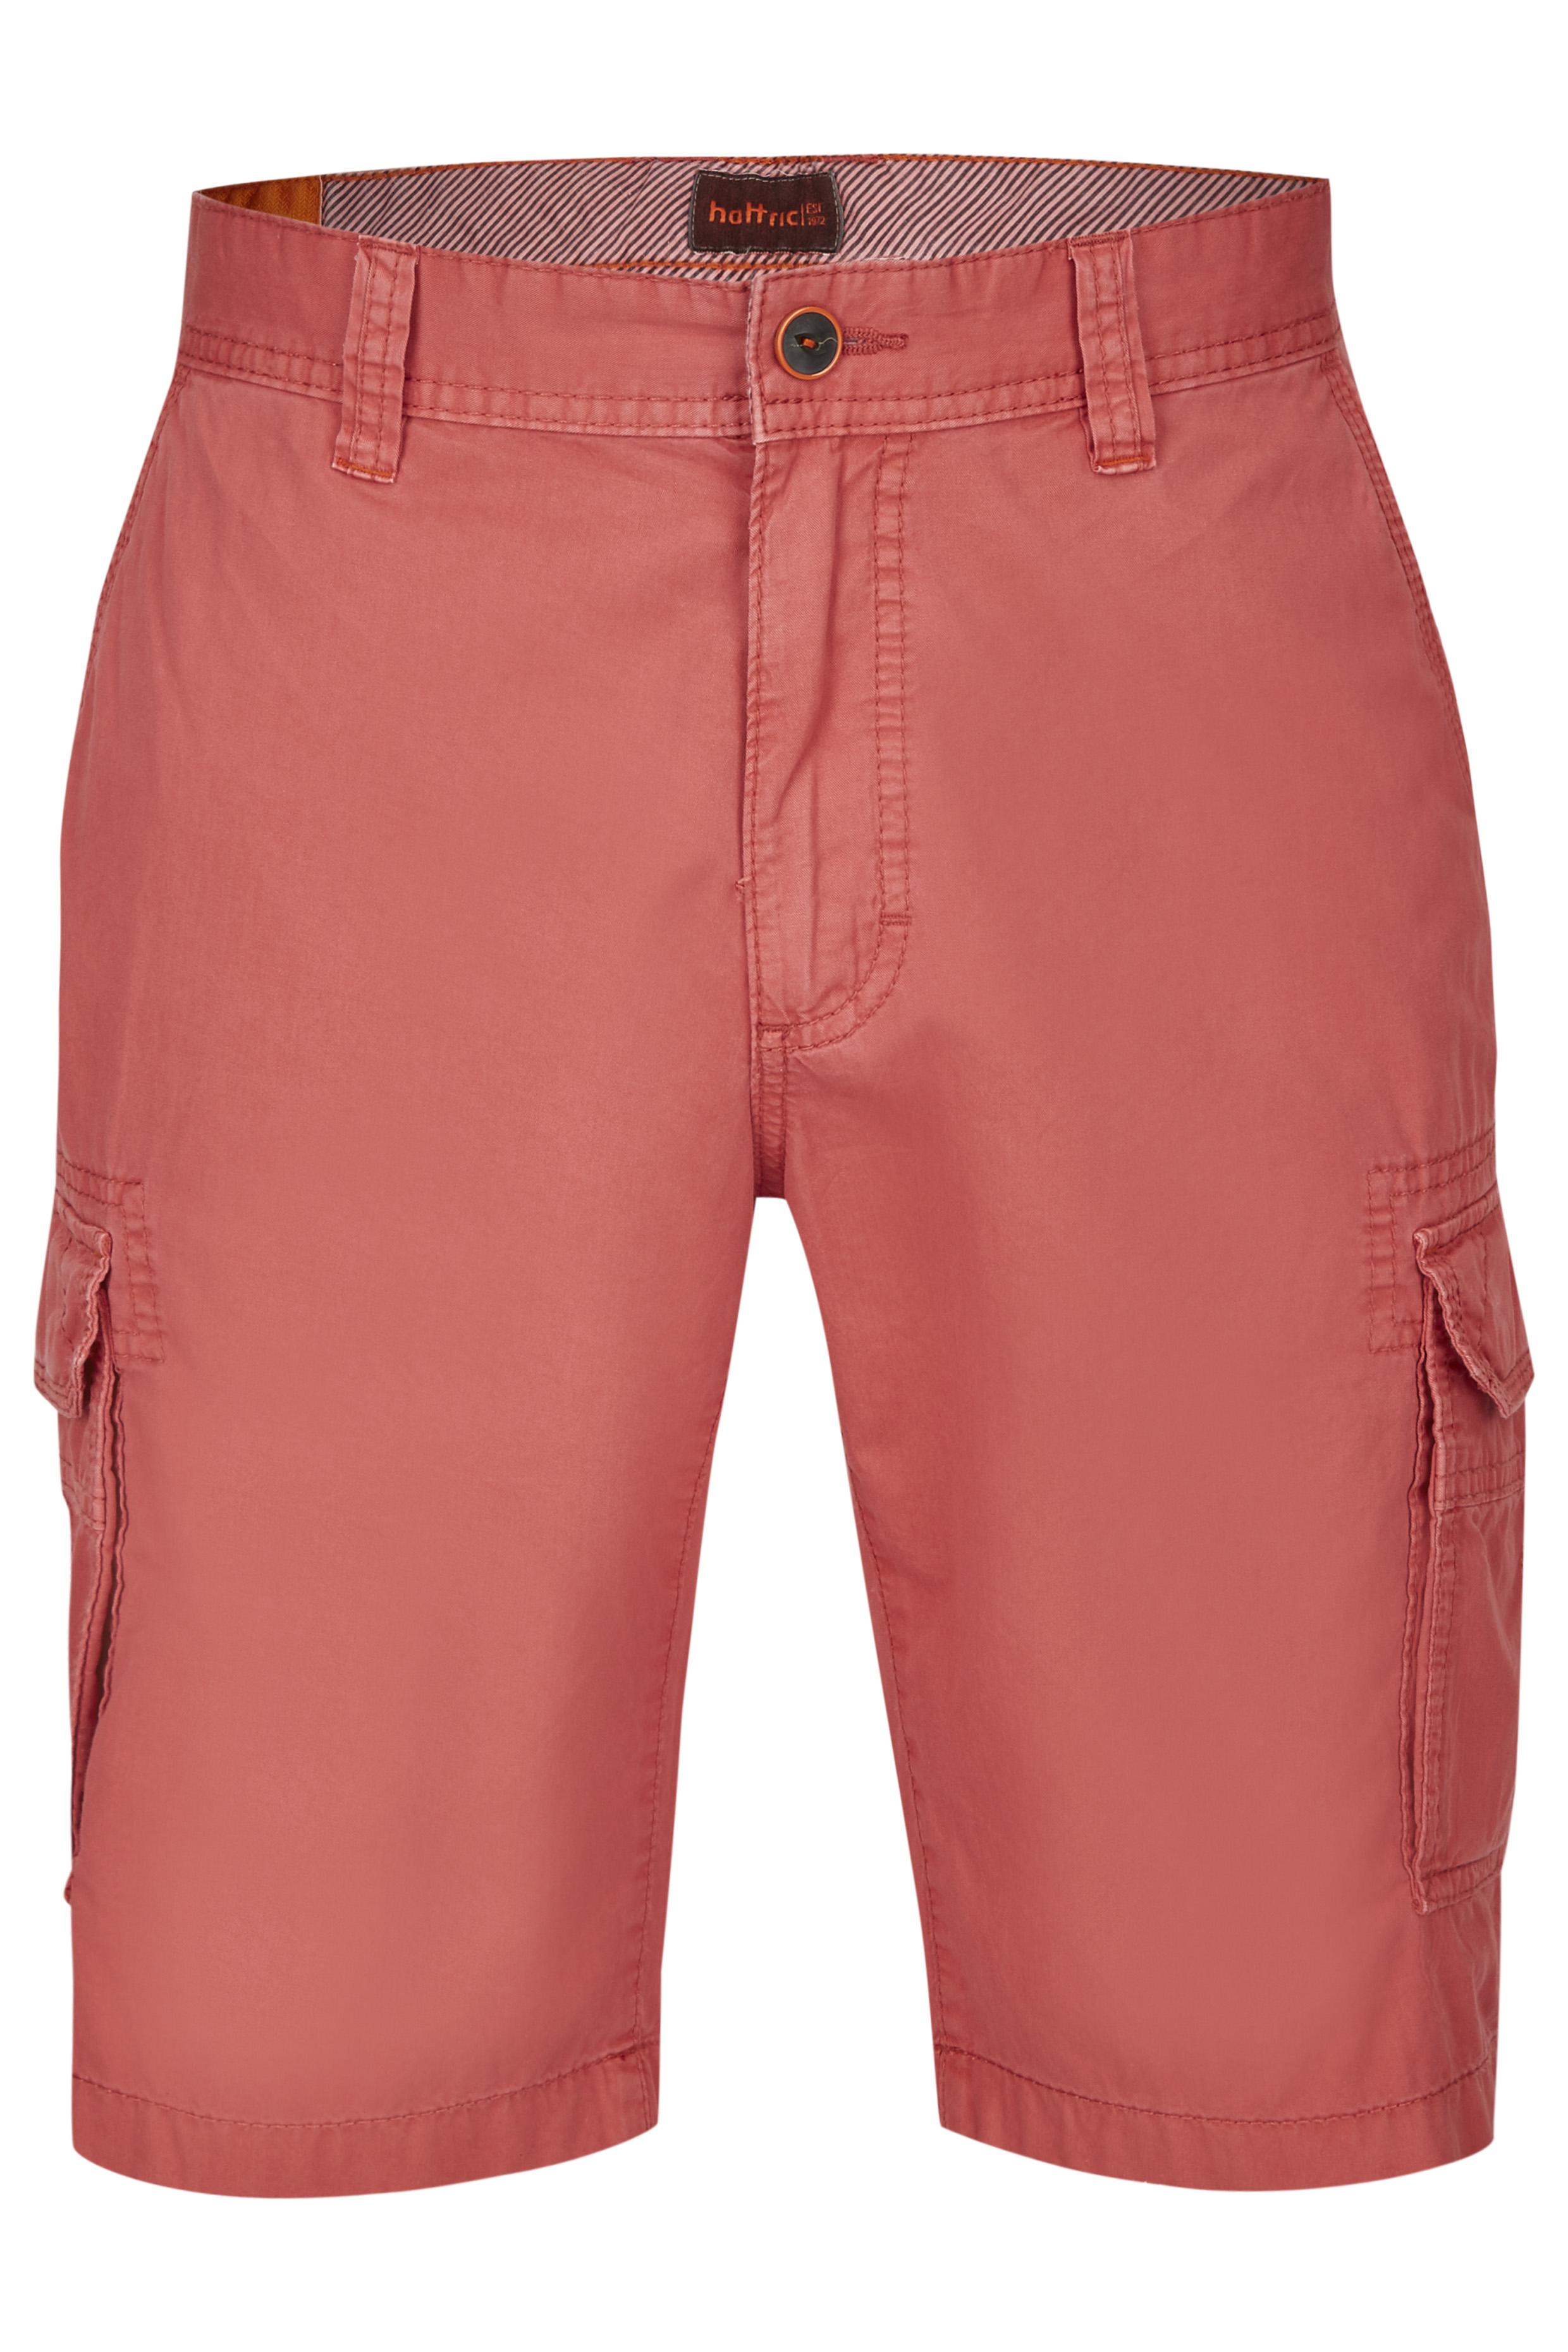 Hattric Jeans Cargohose Bermuda rot